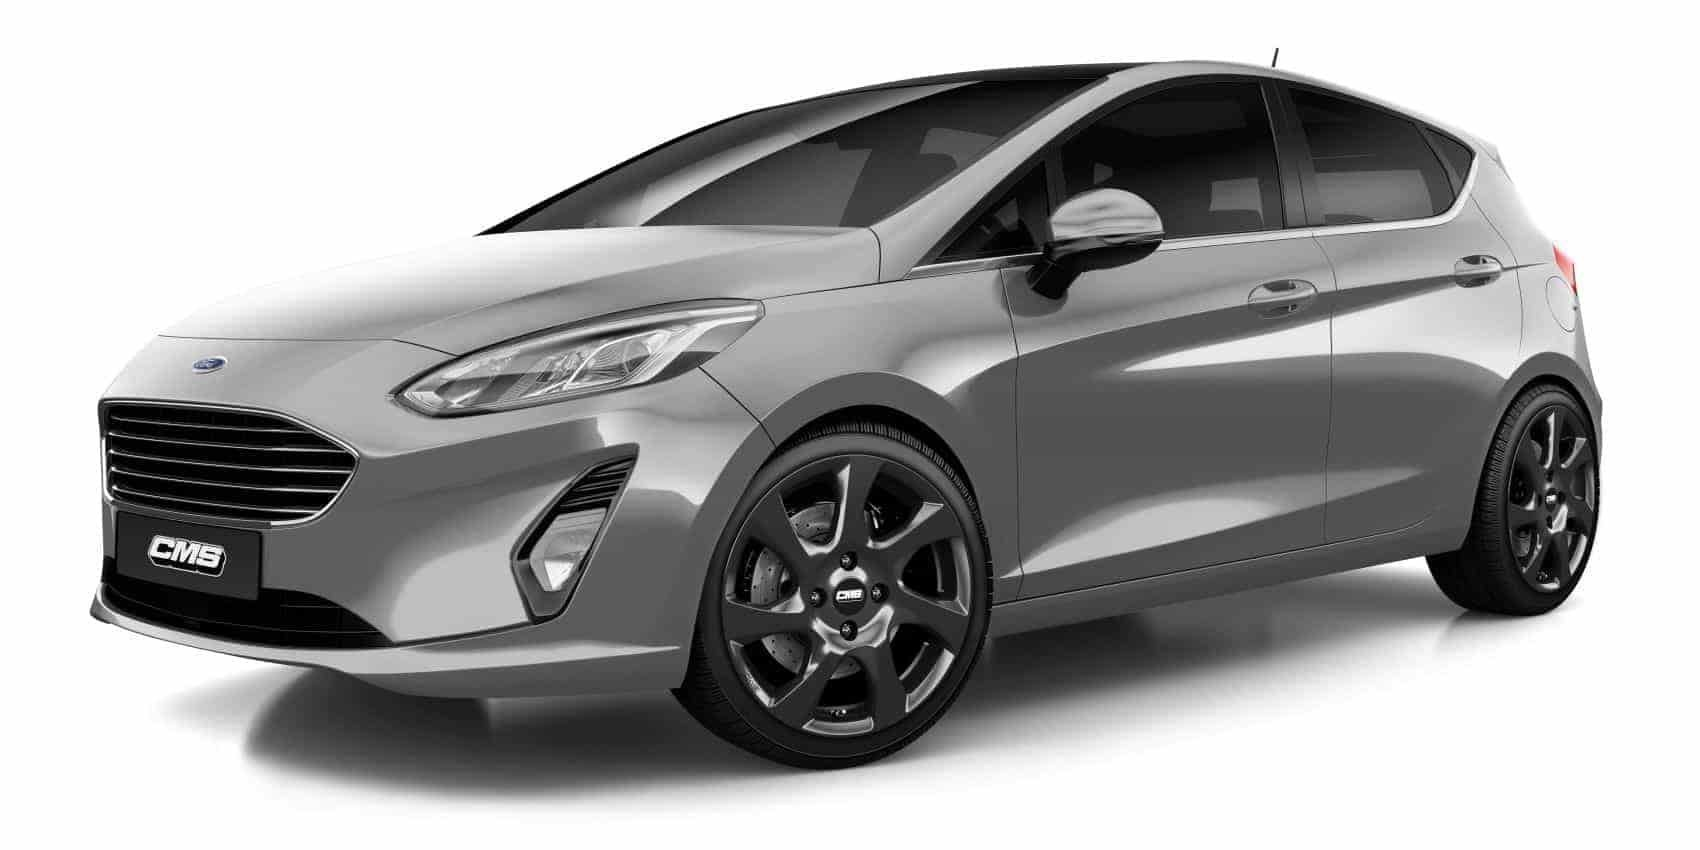 CMS Alufelgen_Ford_Fiesta